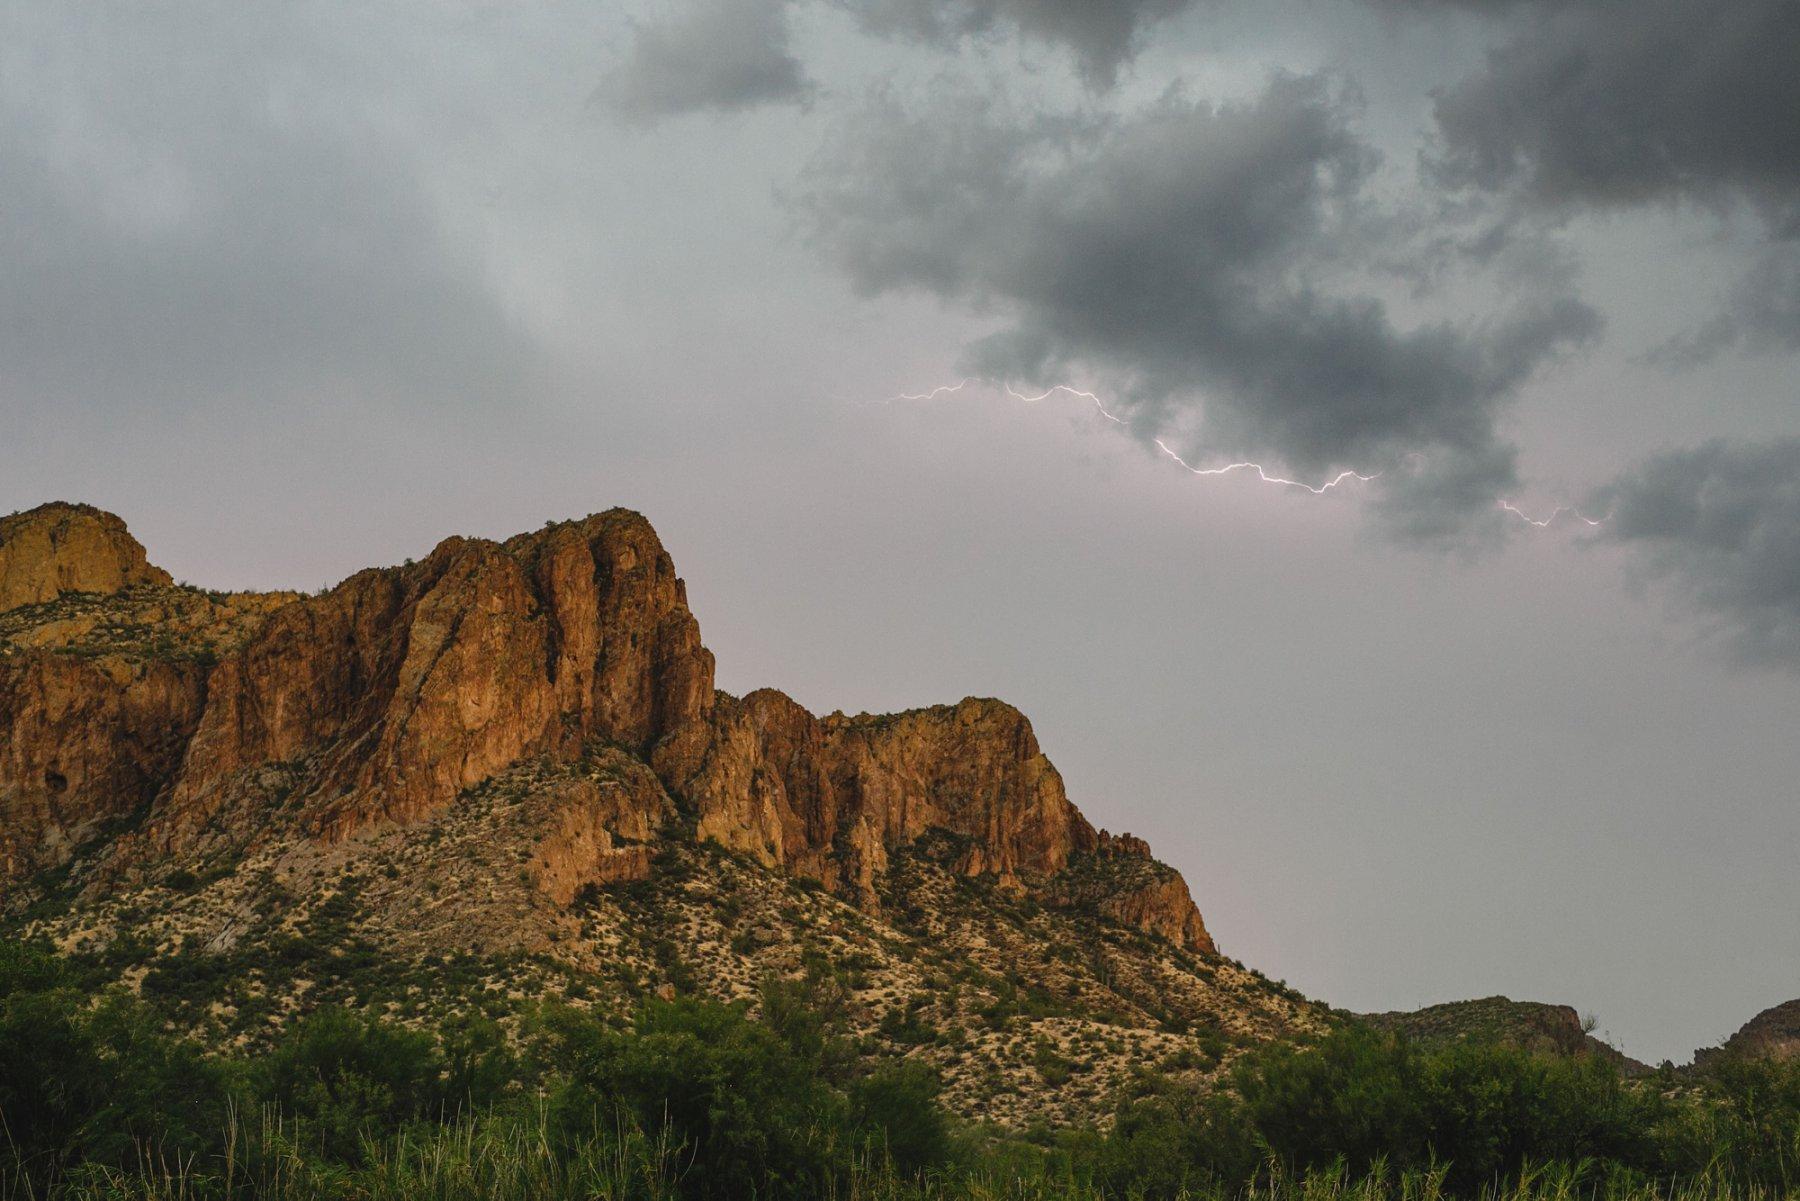 storm with lightning over Salt River Bulldog Mountains